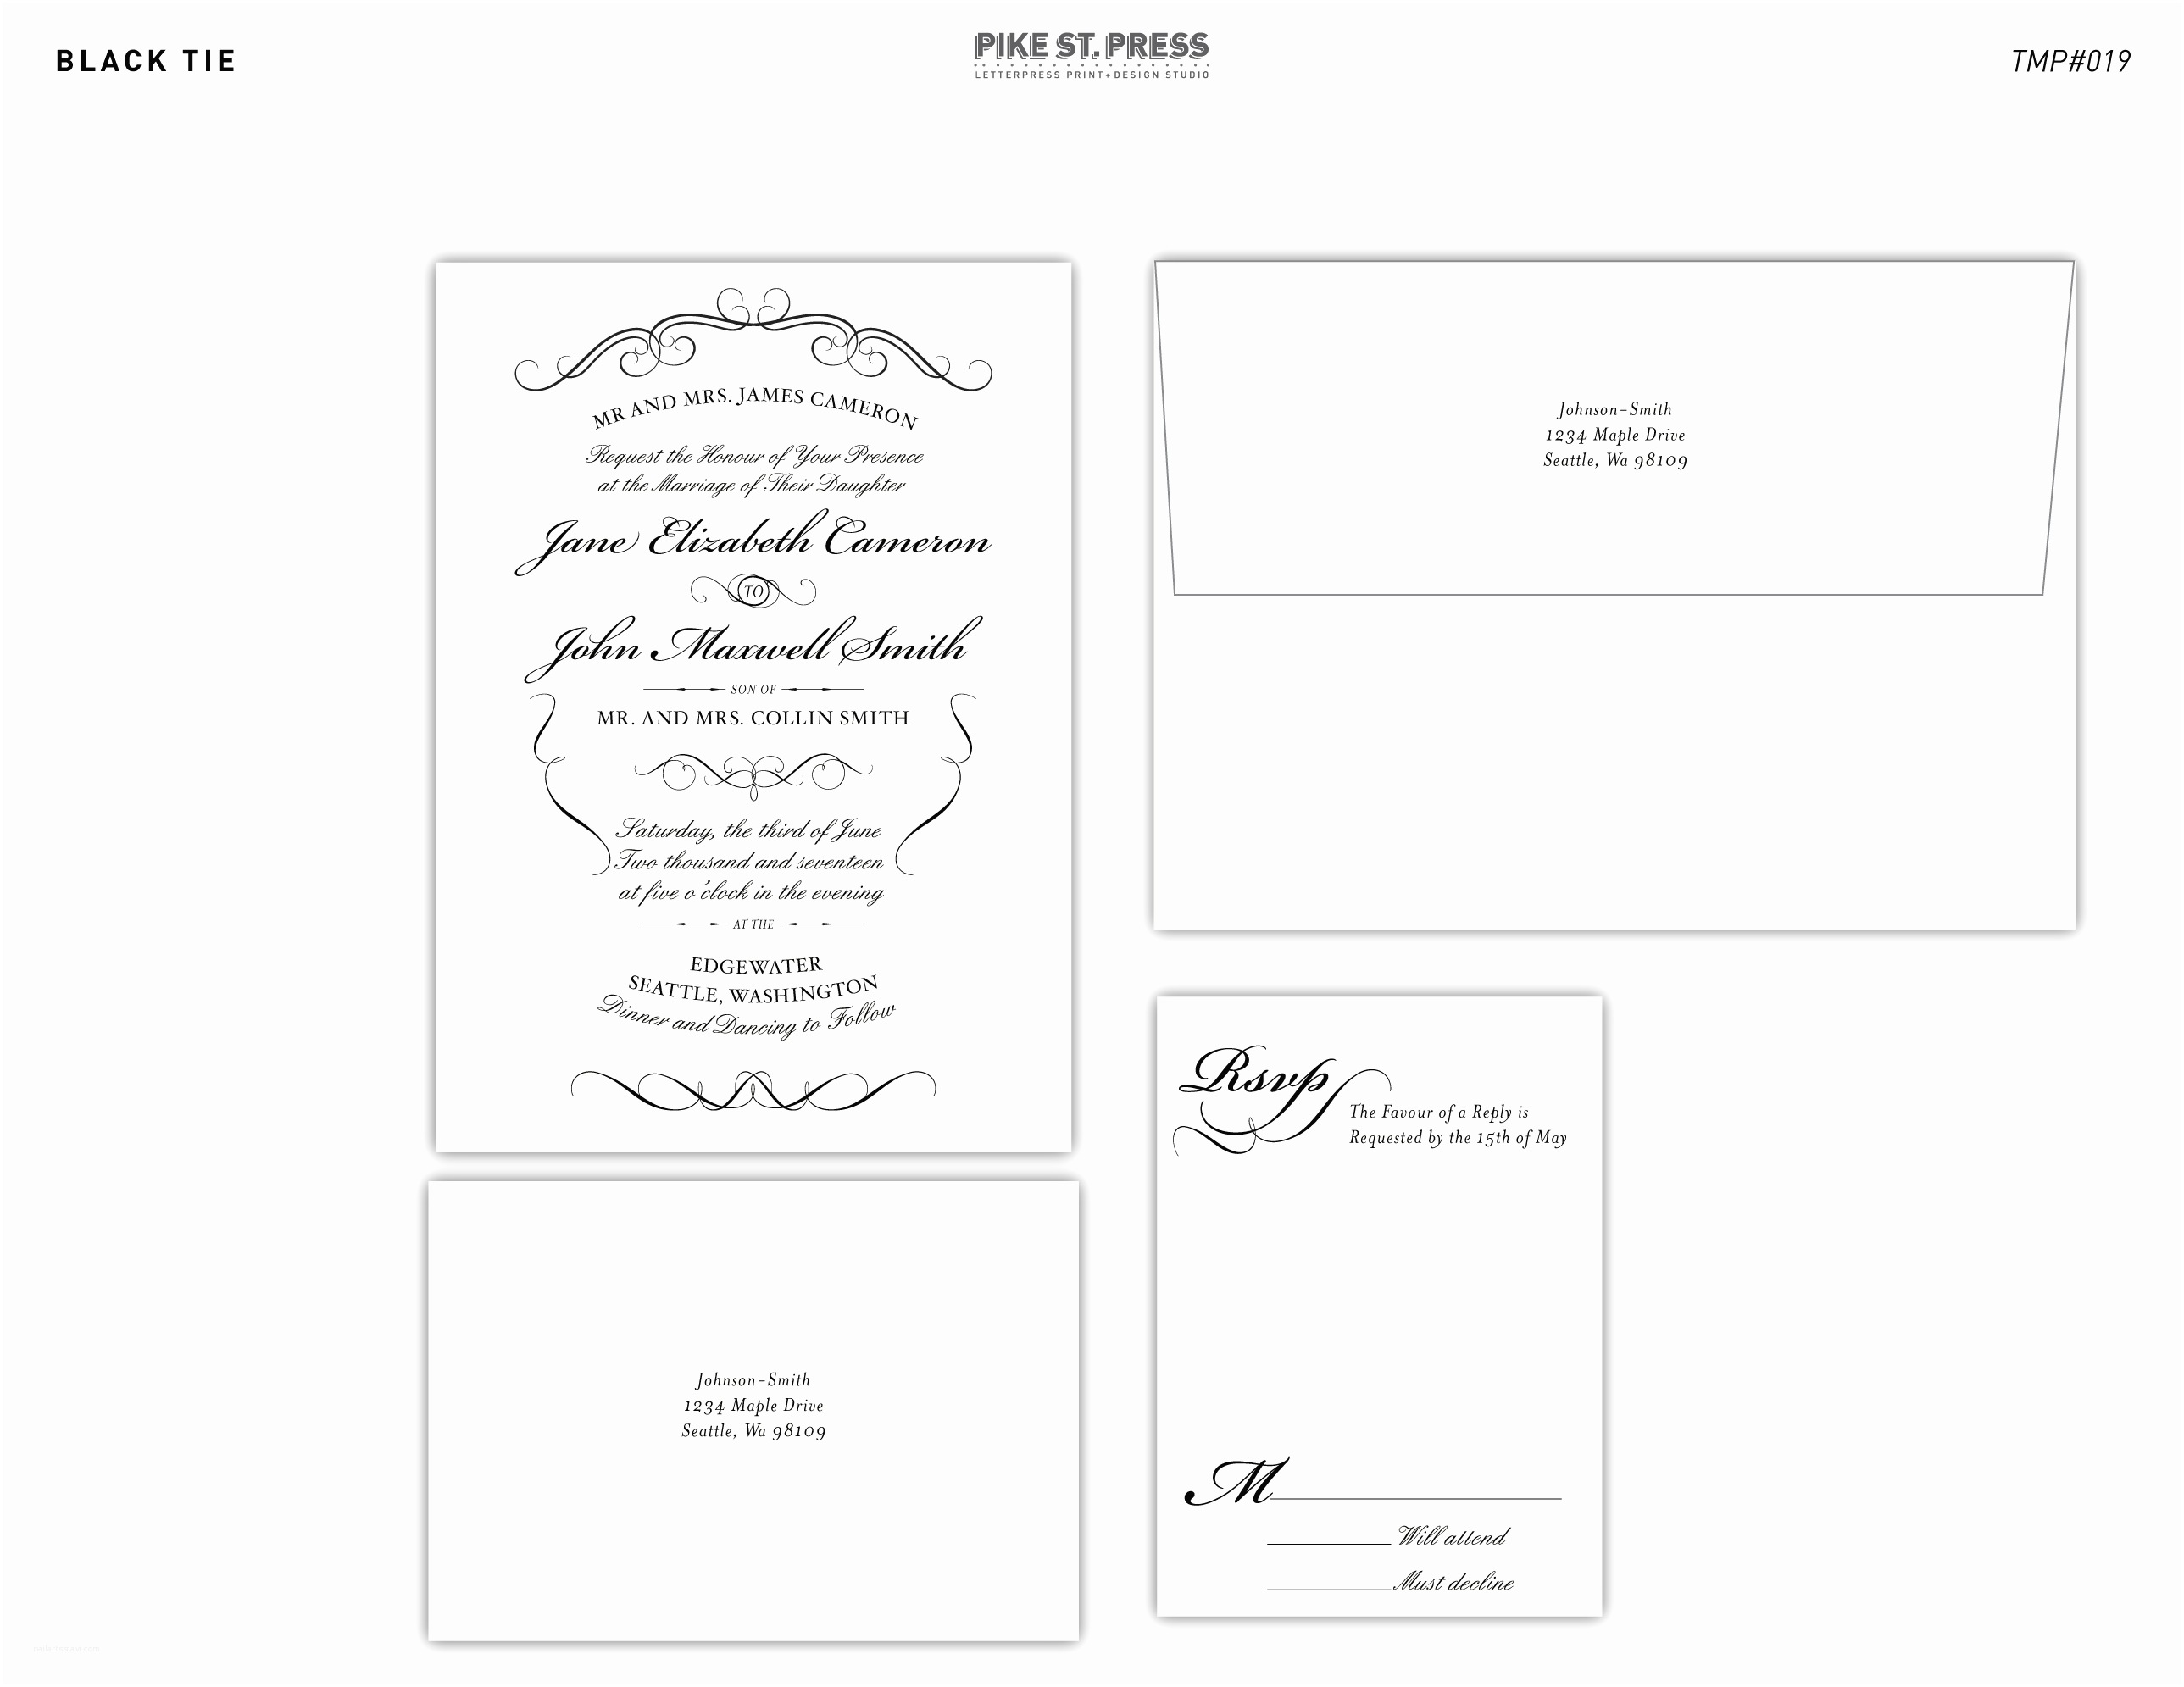 Black Tie Wedding Invitations Black Tie Tmp019 – Wedding Invitation – Pike Street Press